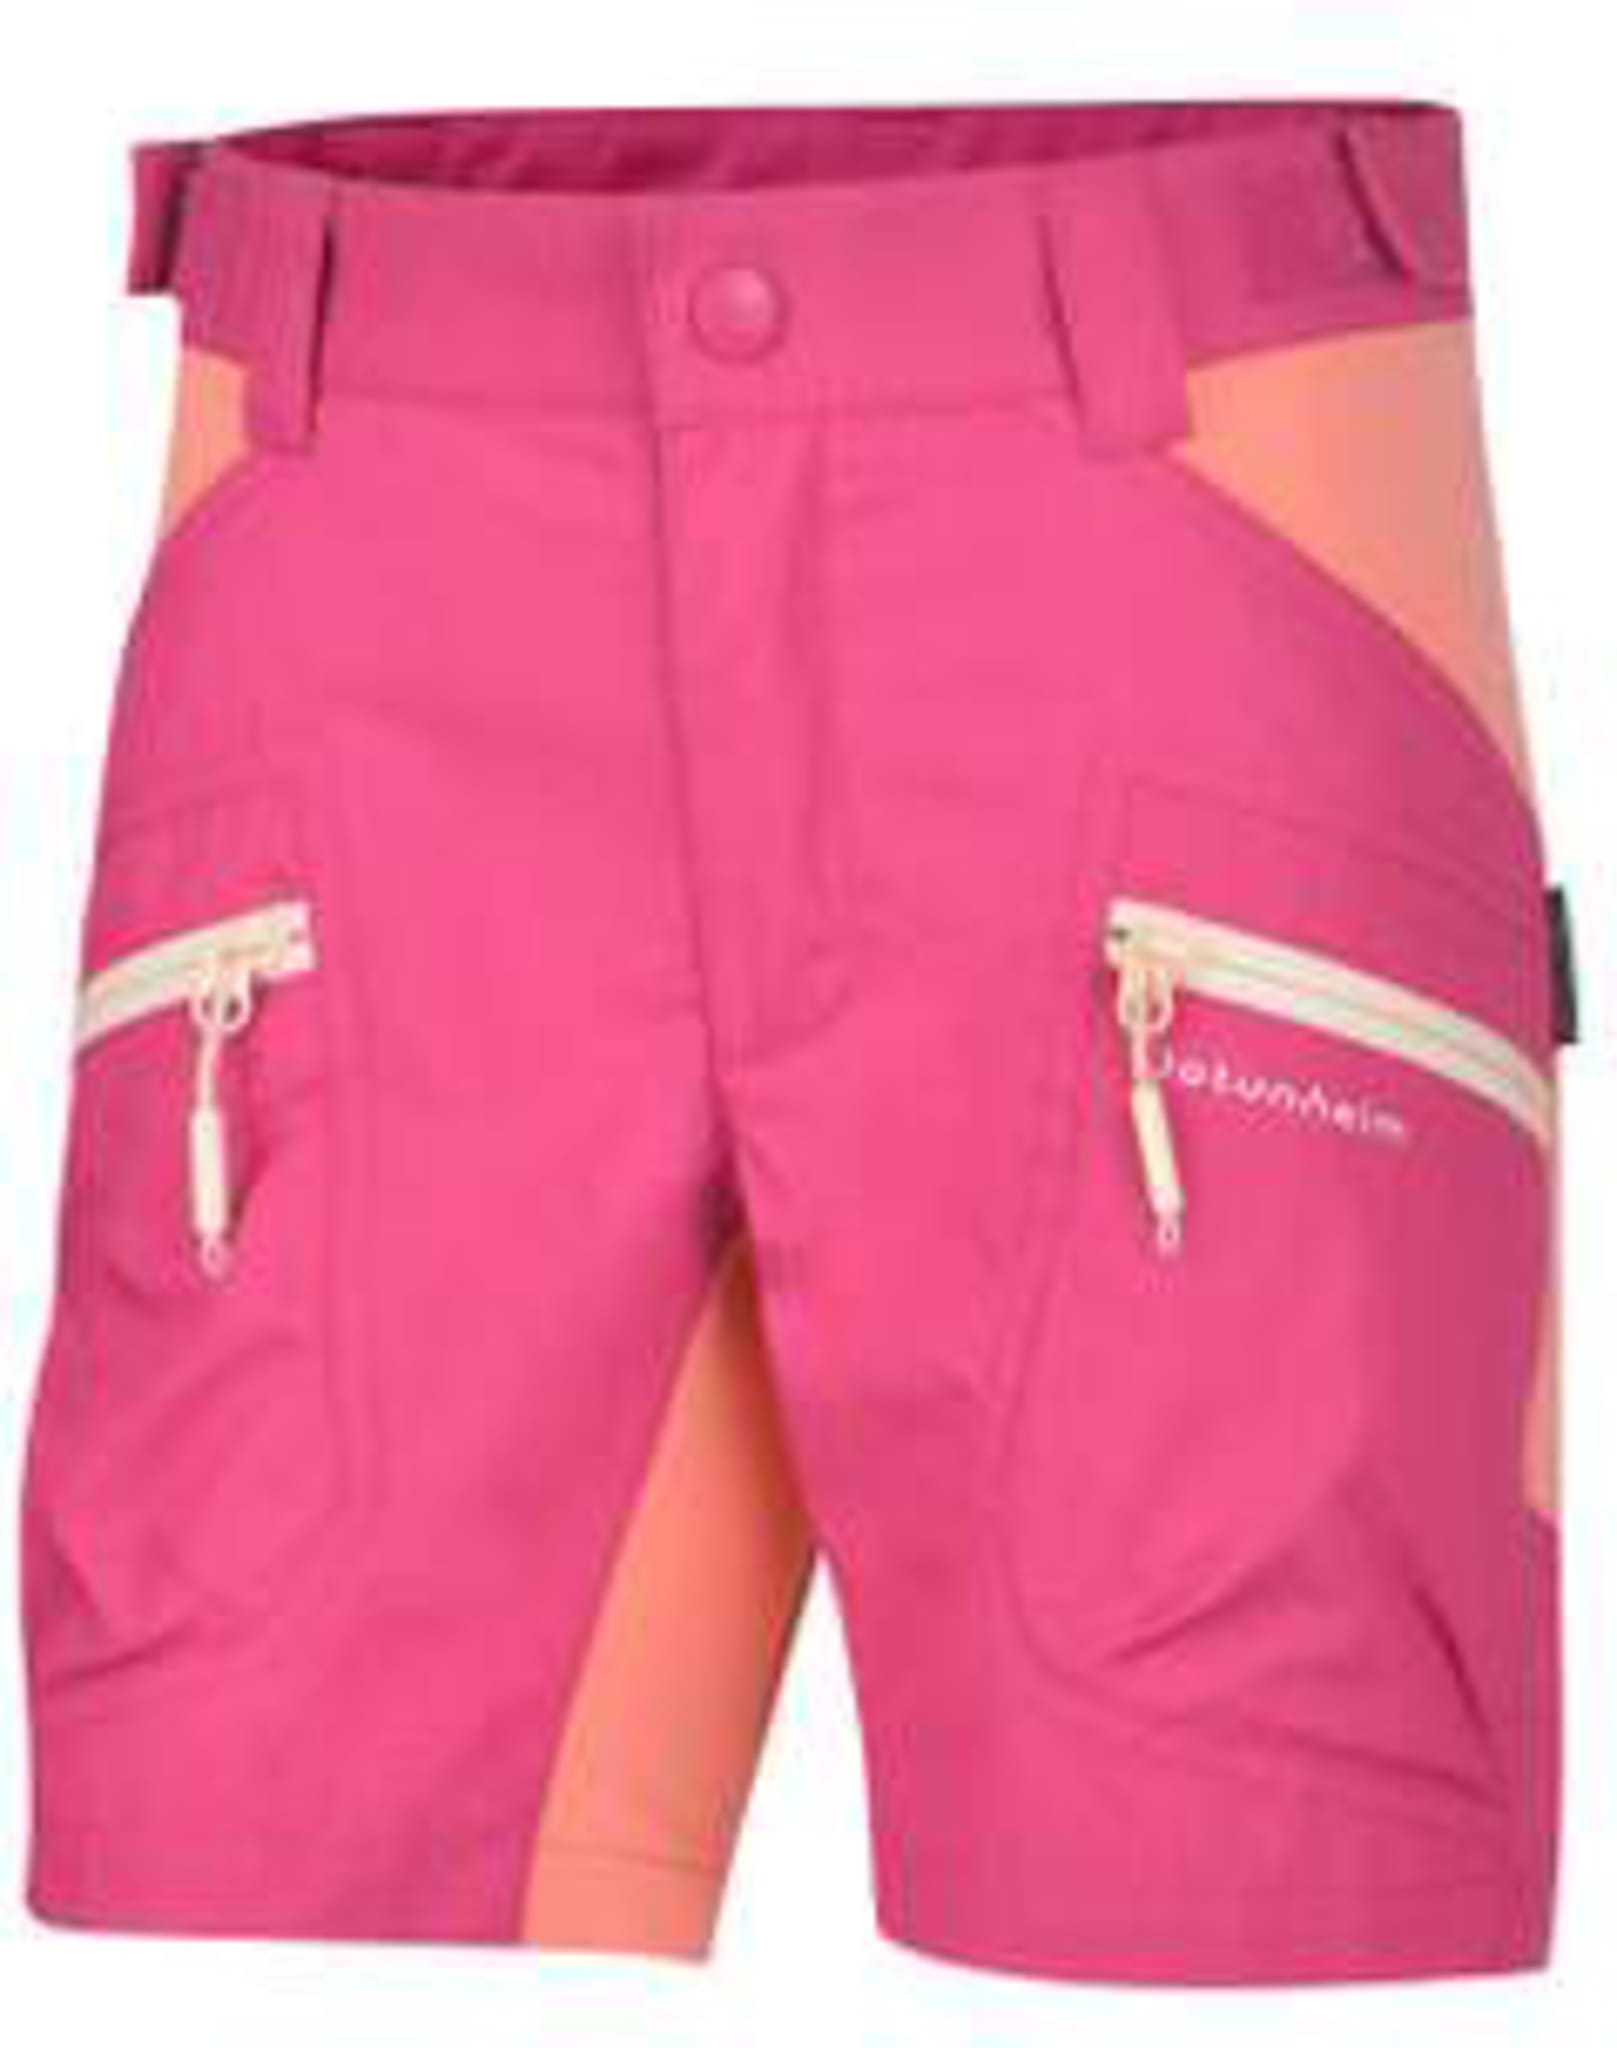 Fossberg Shorts Jr